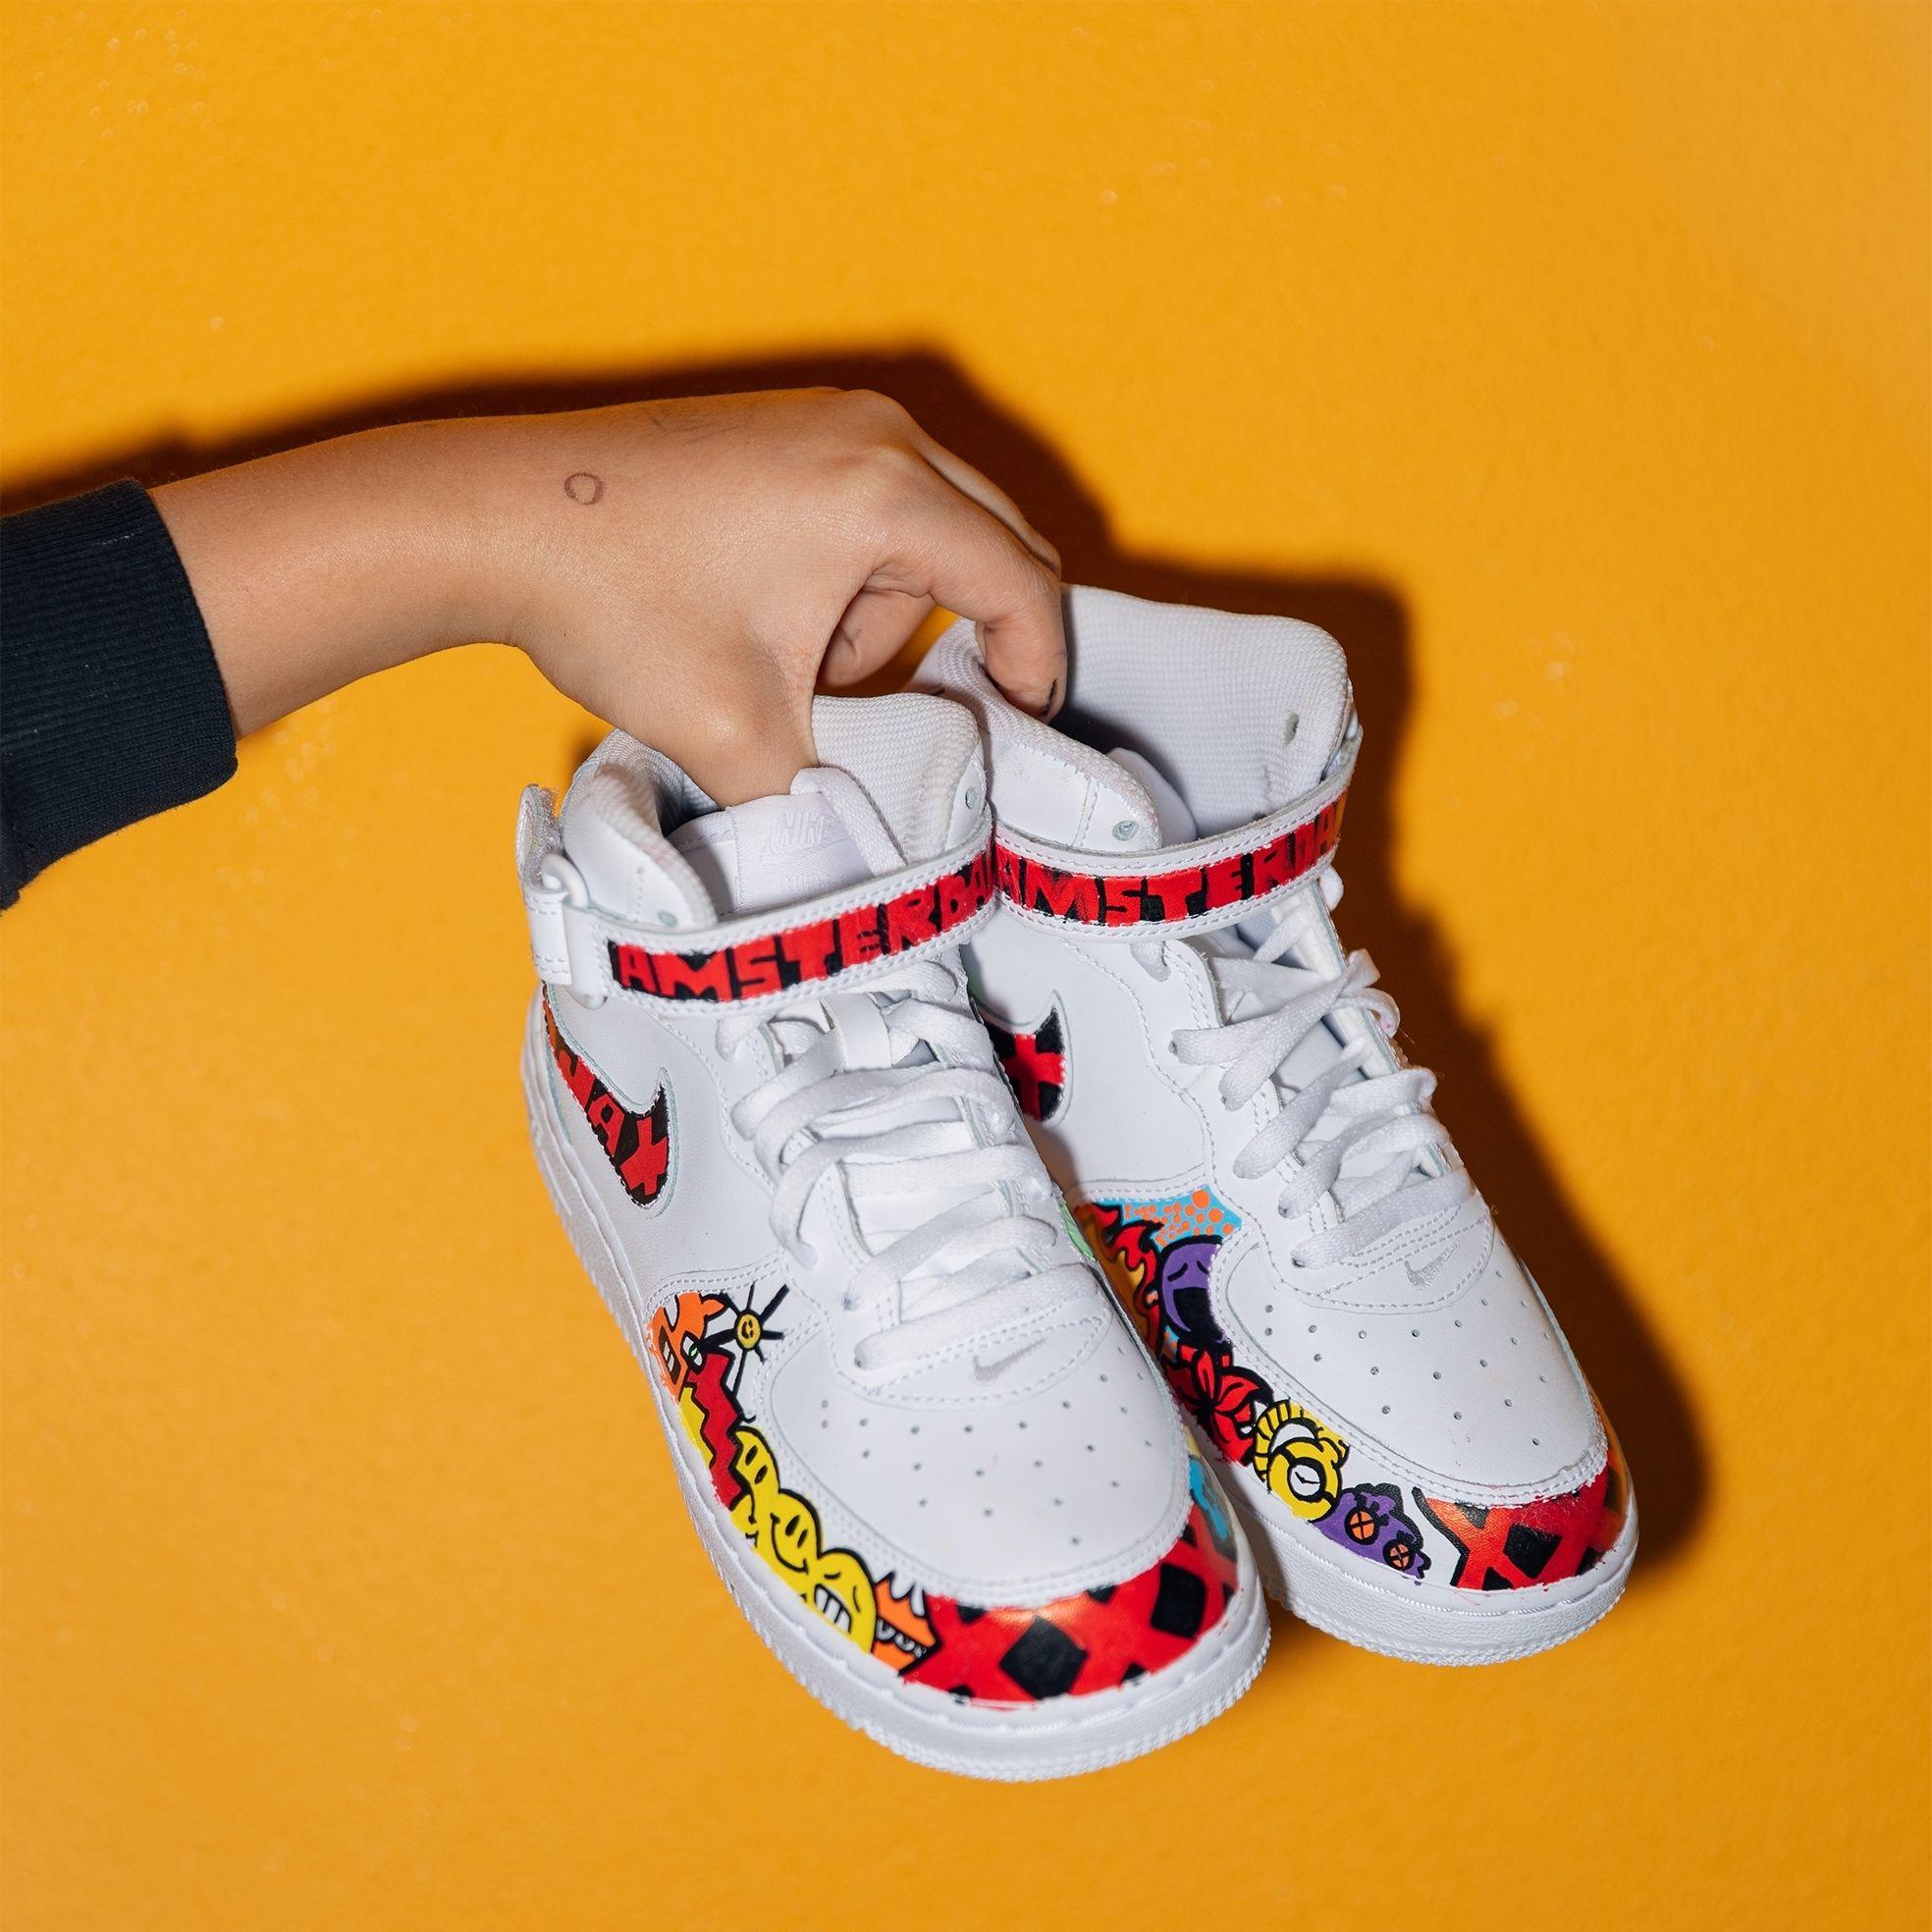 Sneaker design Moos Polak